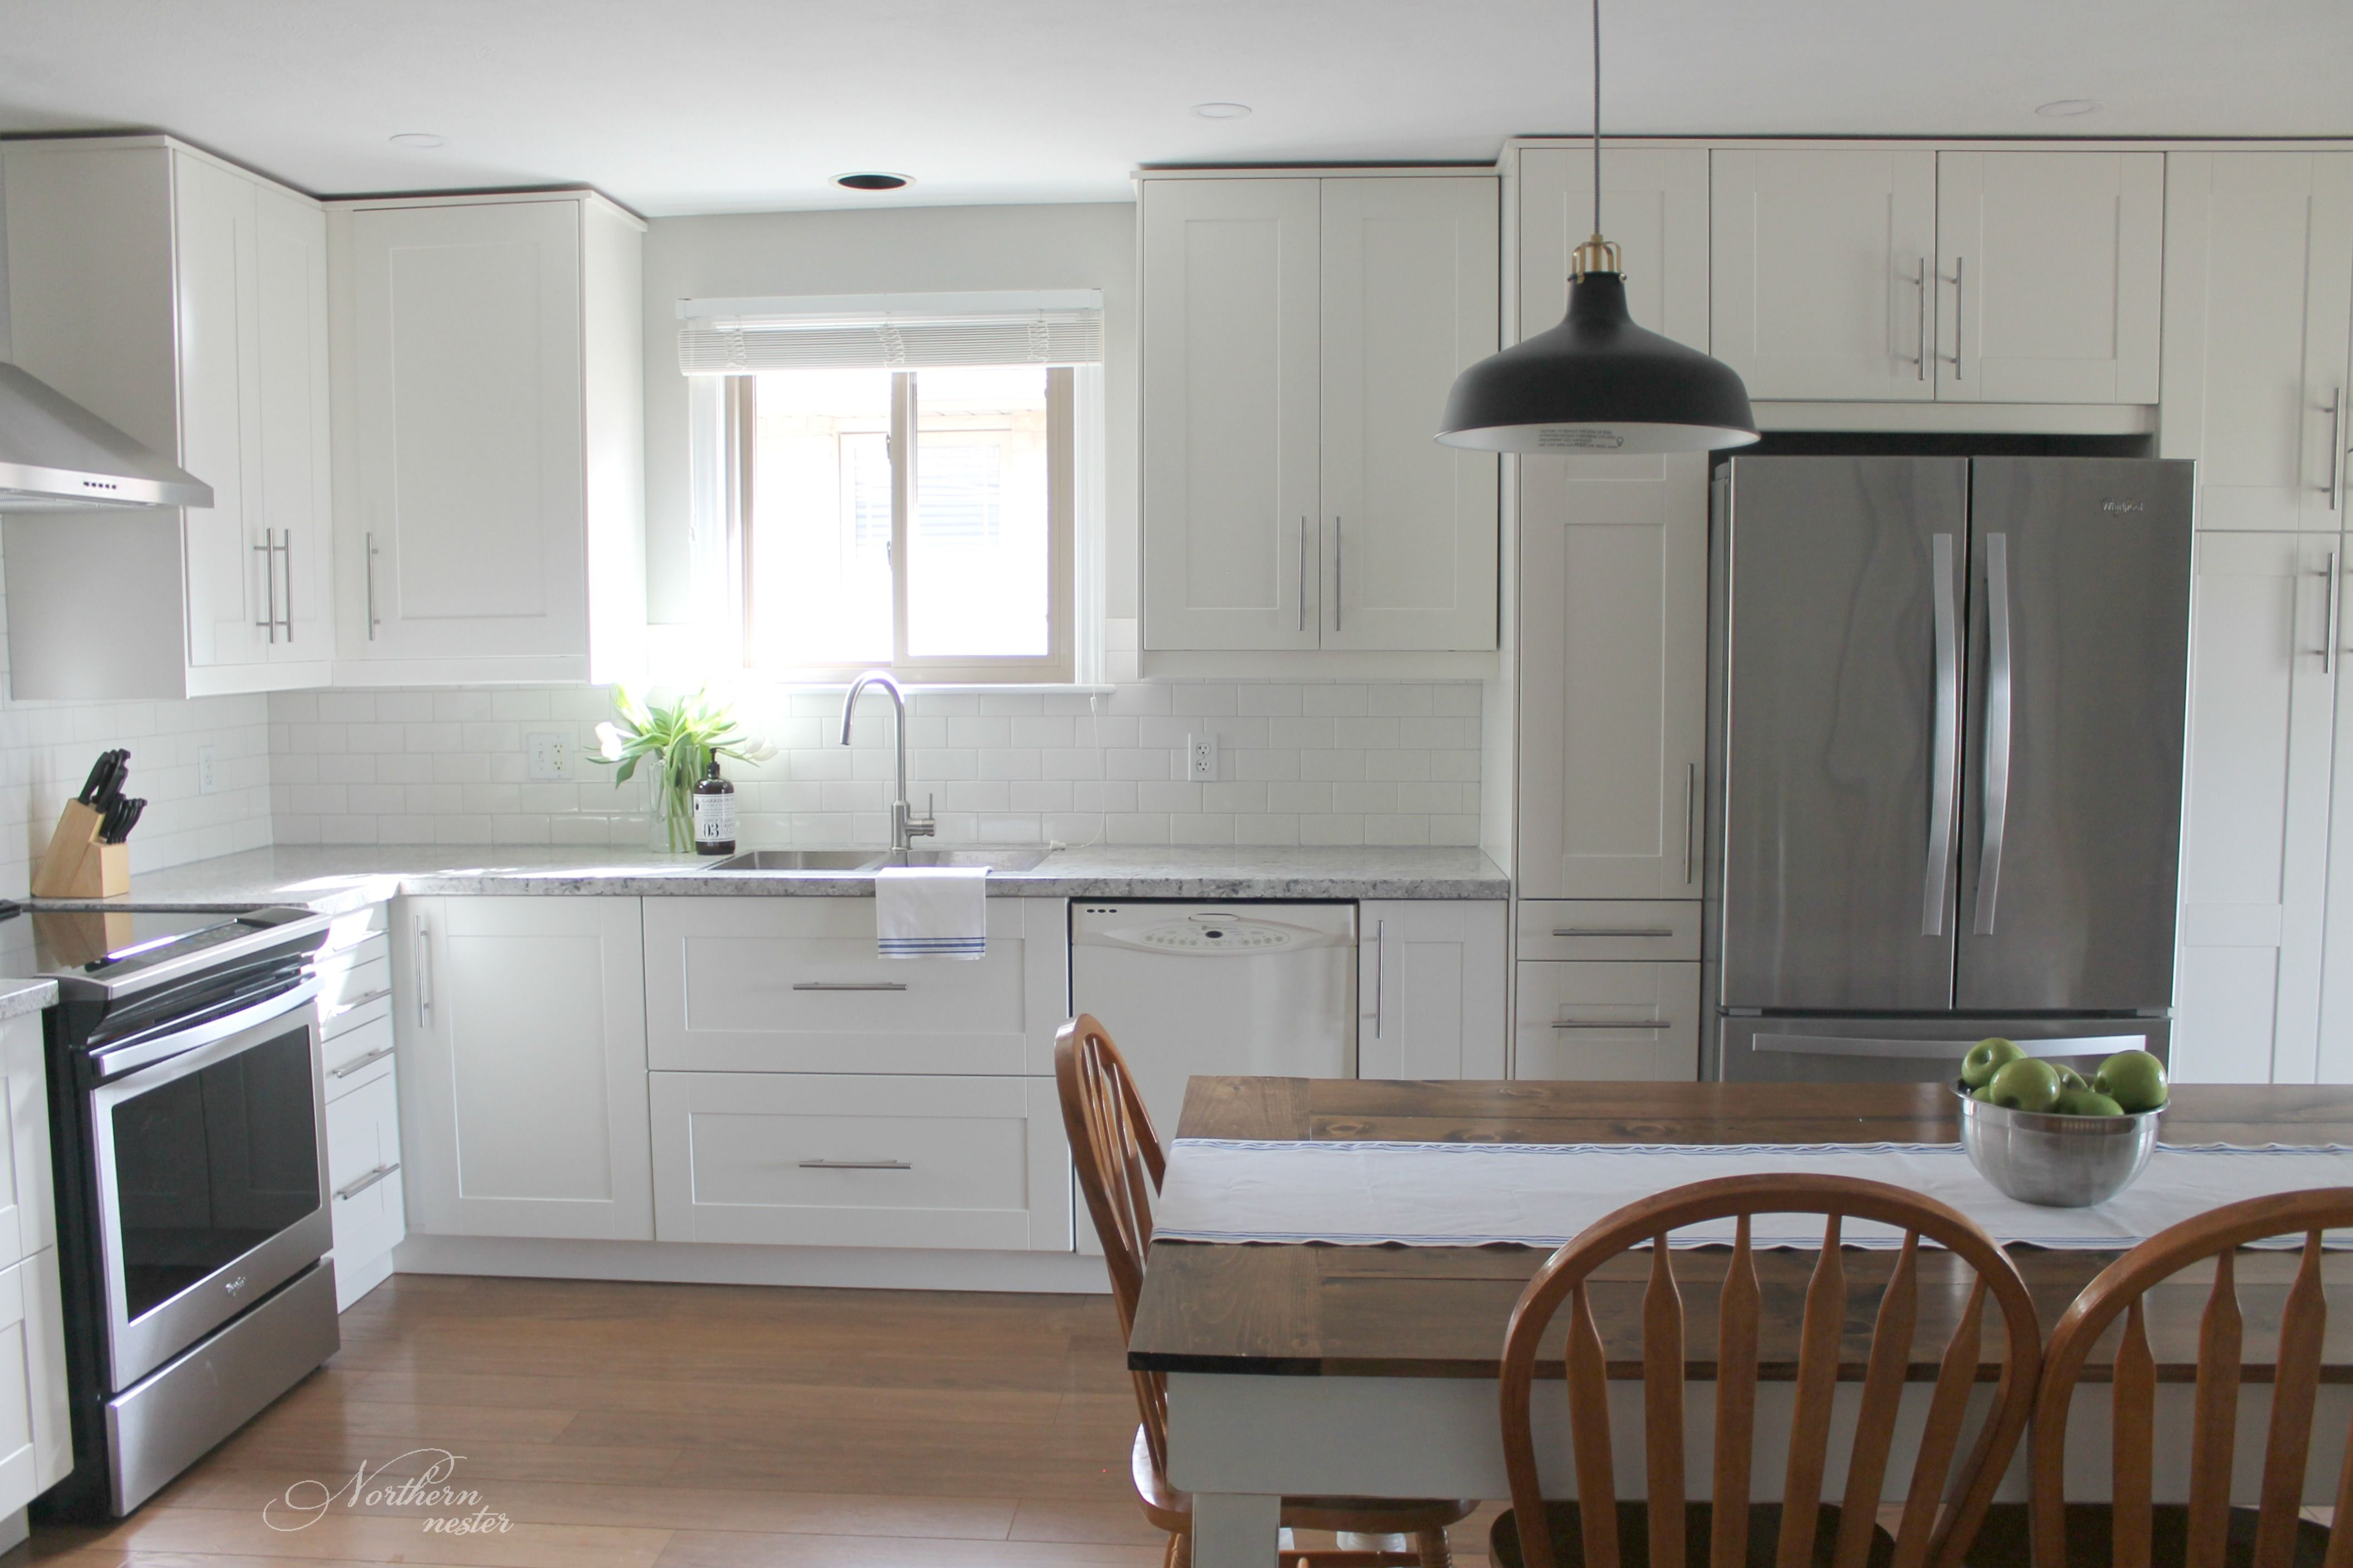 Inspirational Ikea Cabinet Cost Per Linear Foot